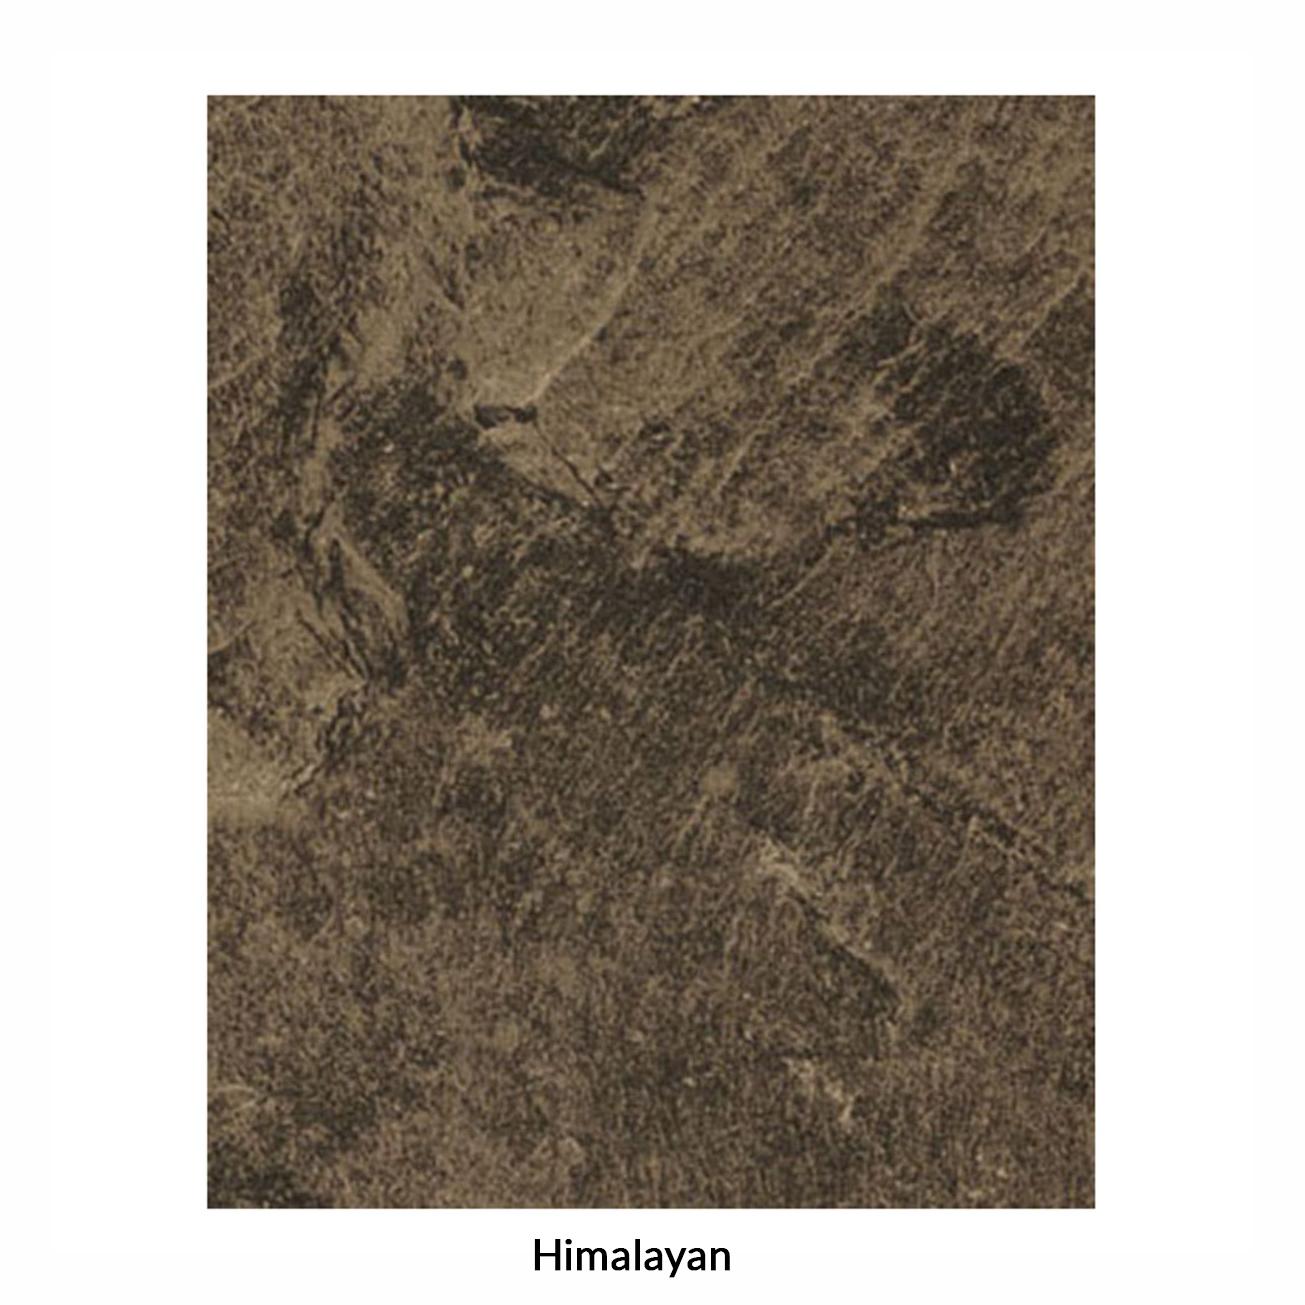 12-himalayan-slate.jpg